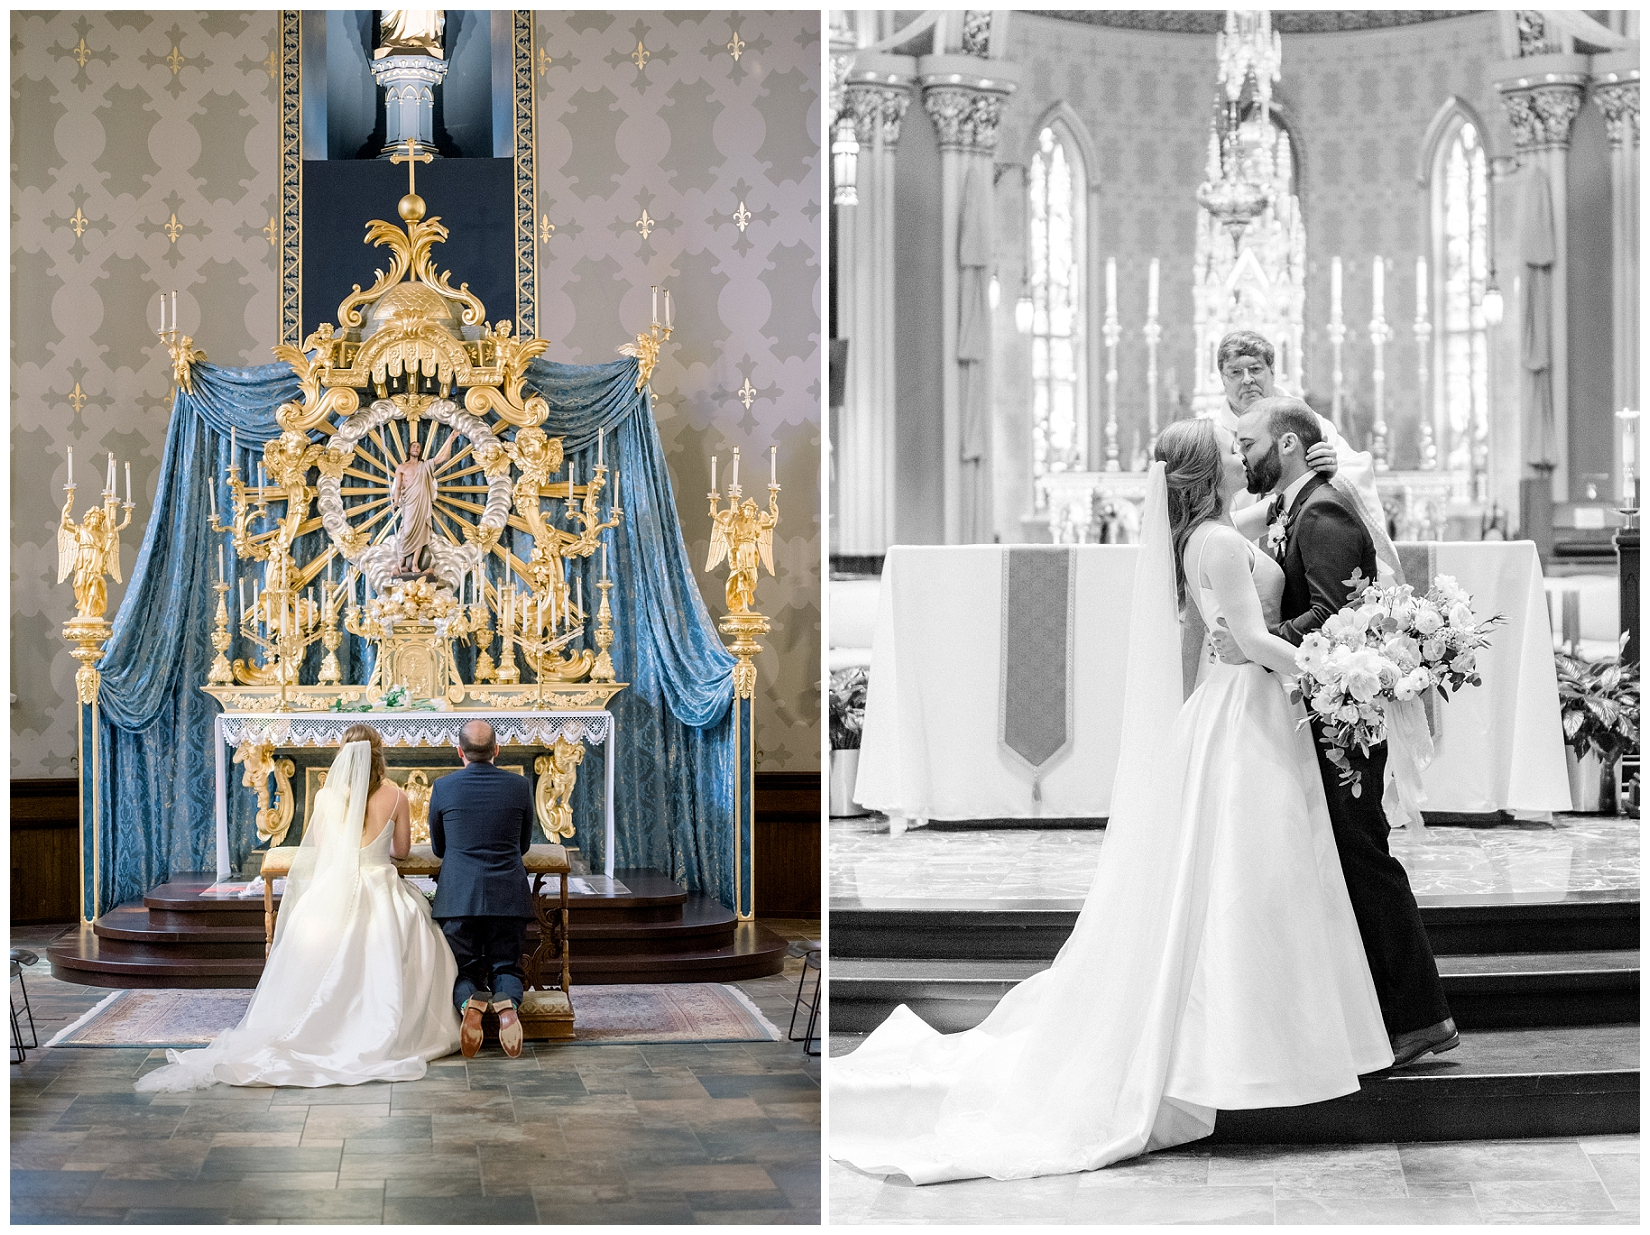 cat-alkire-wedding-photographer-indiana-chicago-indianapolis-fort-wayne_1202.jpg